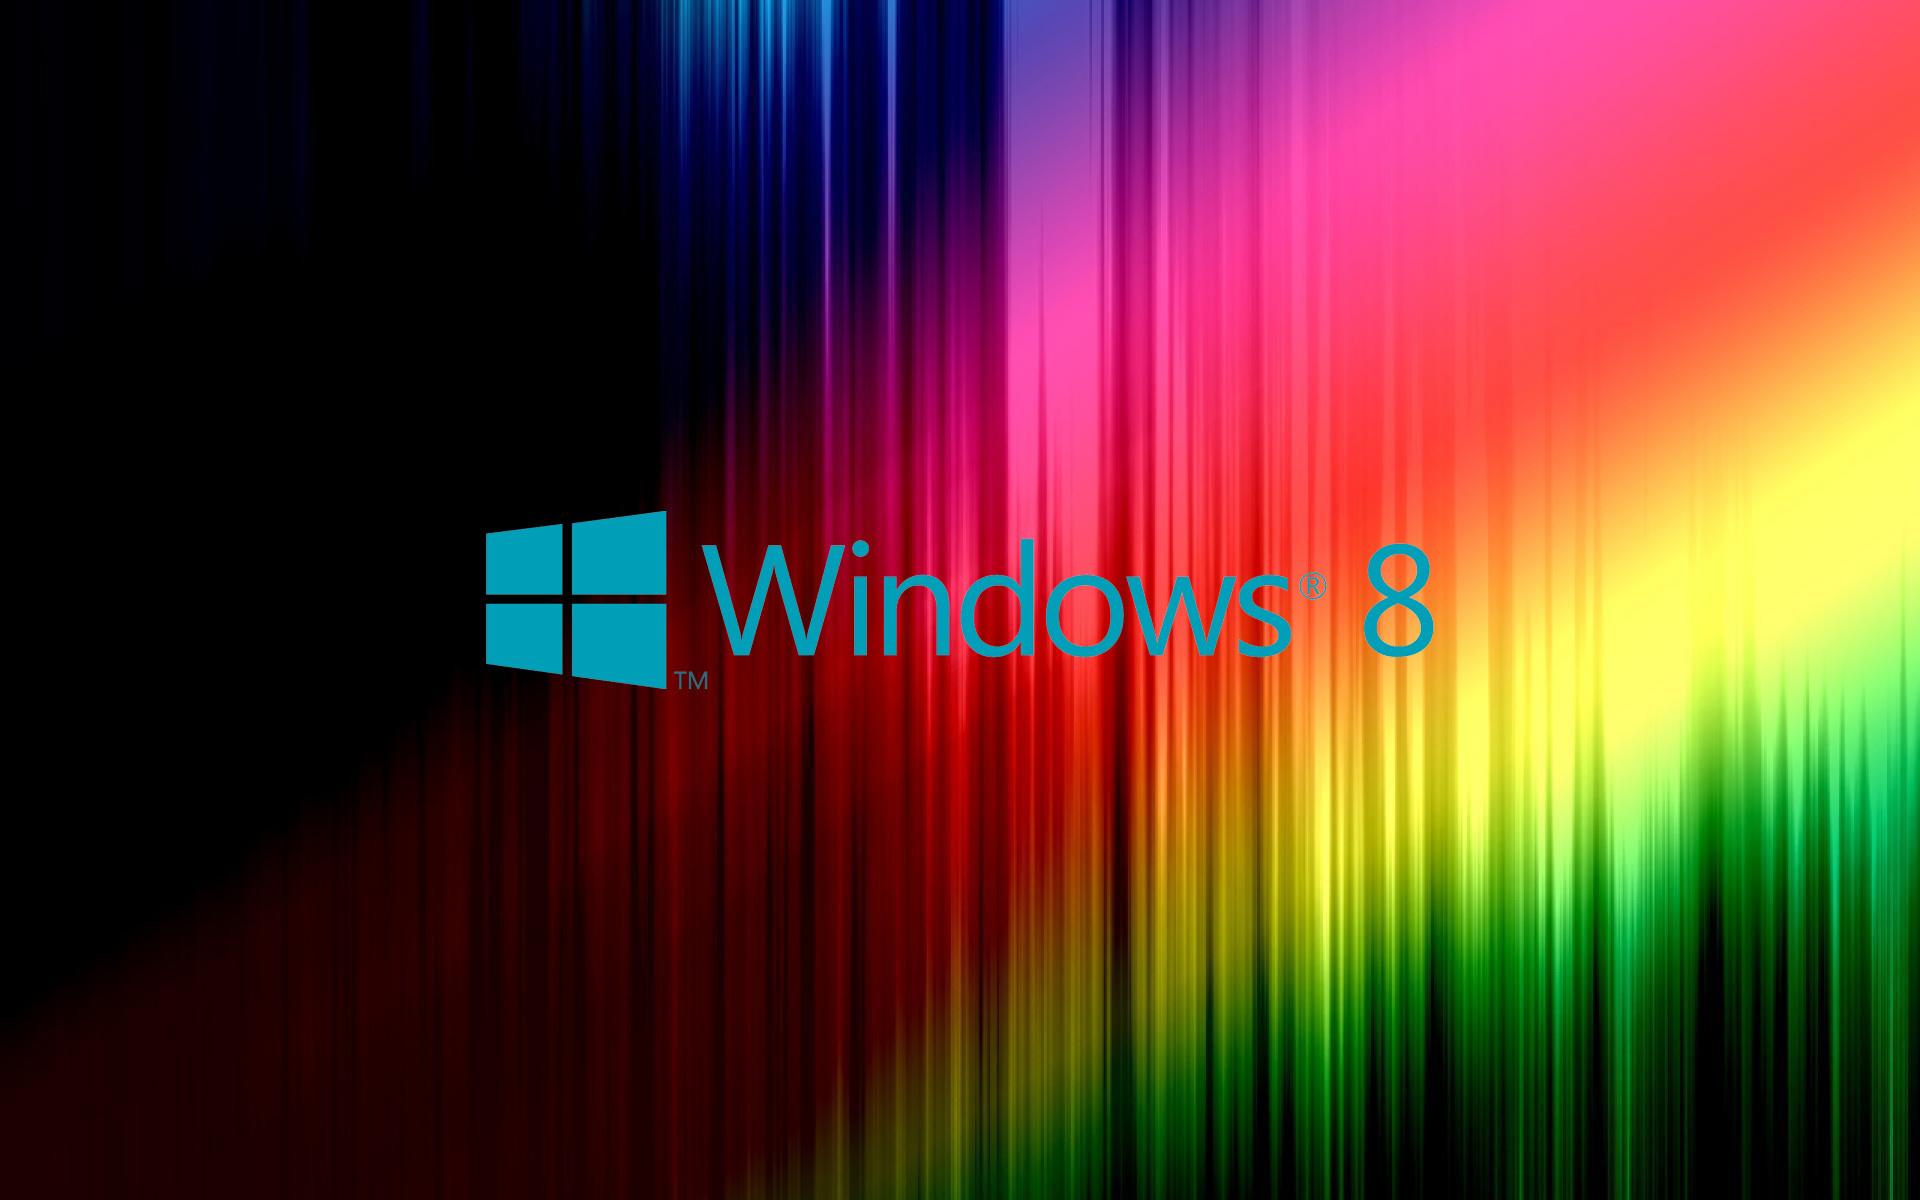 Amazing Wallpaper High Quality Windows 8 - windows-8-high-quality-hd-wallpaper-desktop  Image_464579.jpg?w\u003d1200